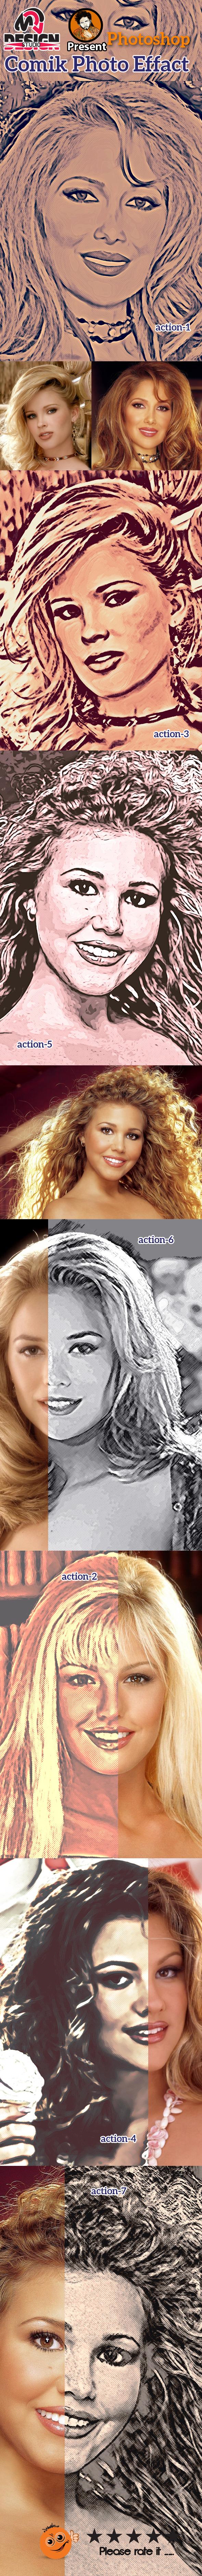 GraphicRiver Comik Photo Effect 10242488